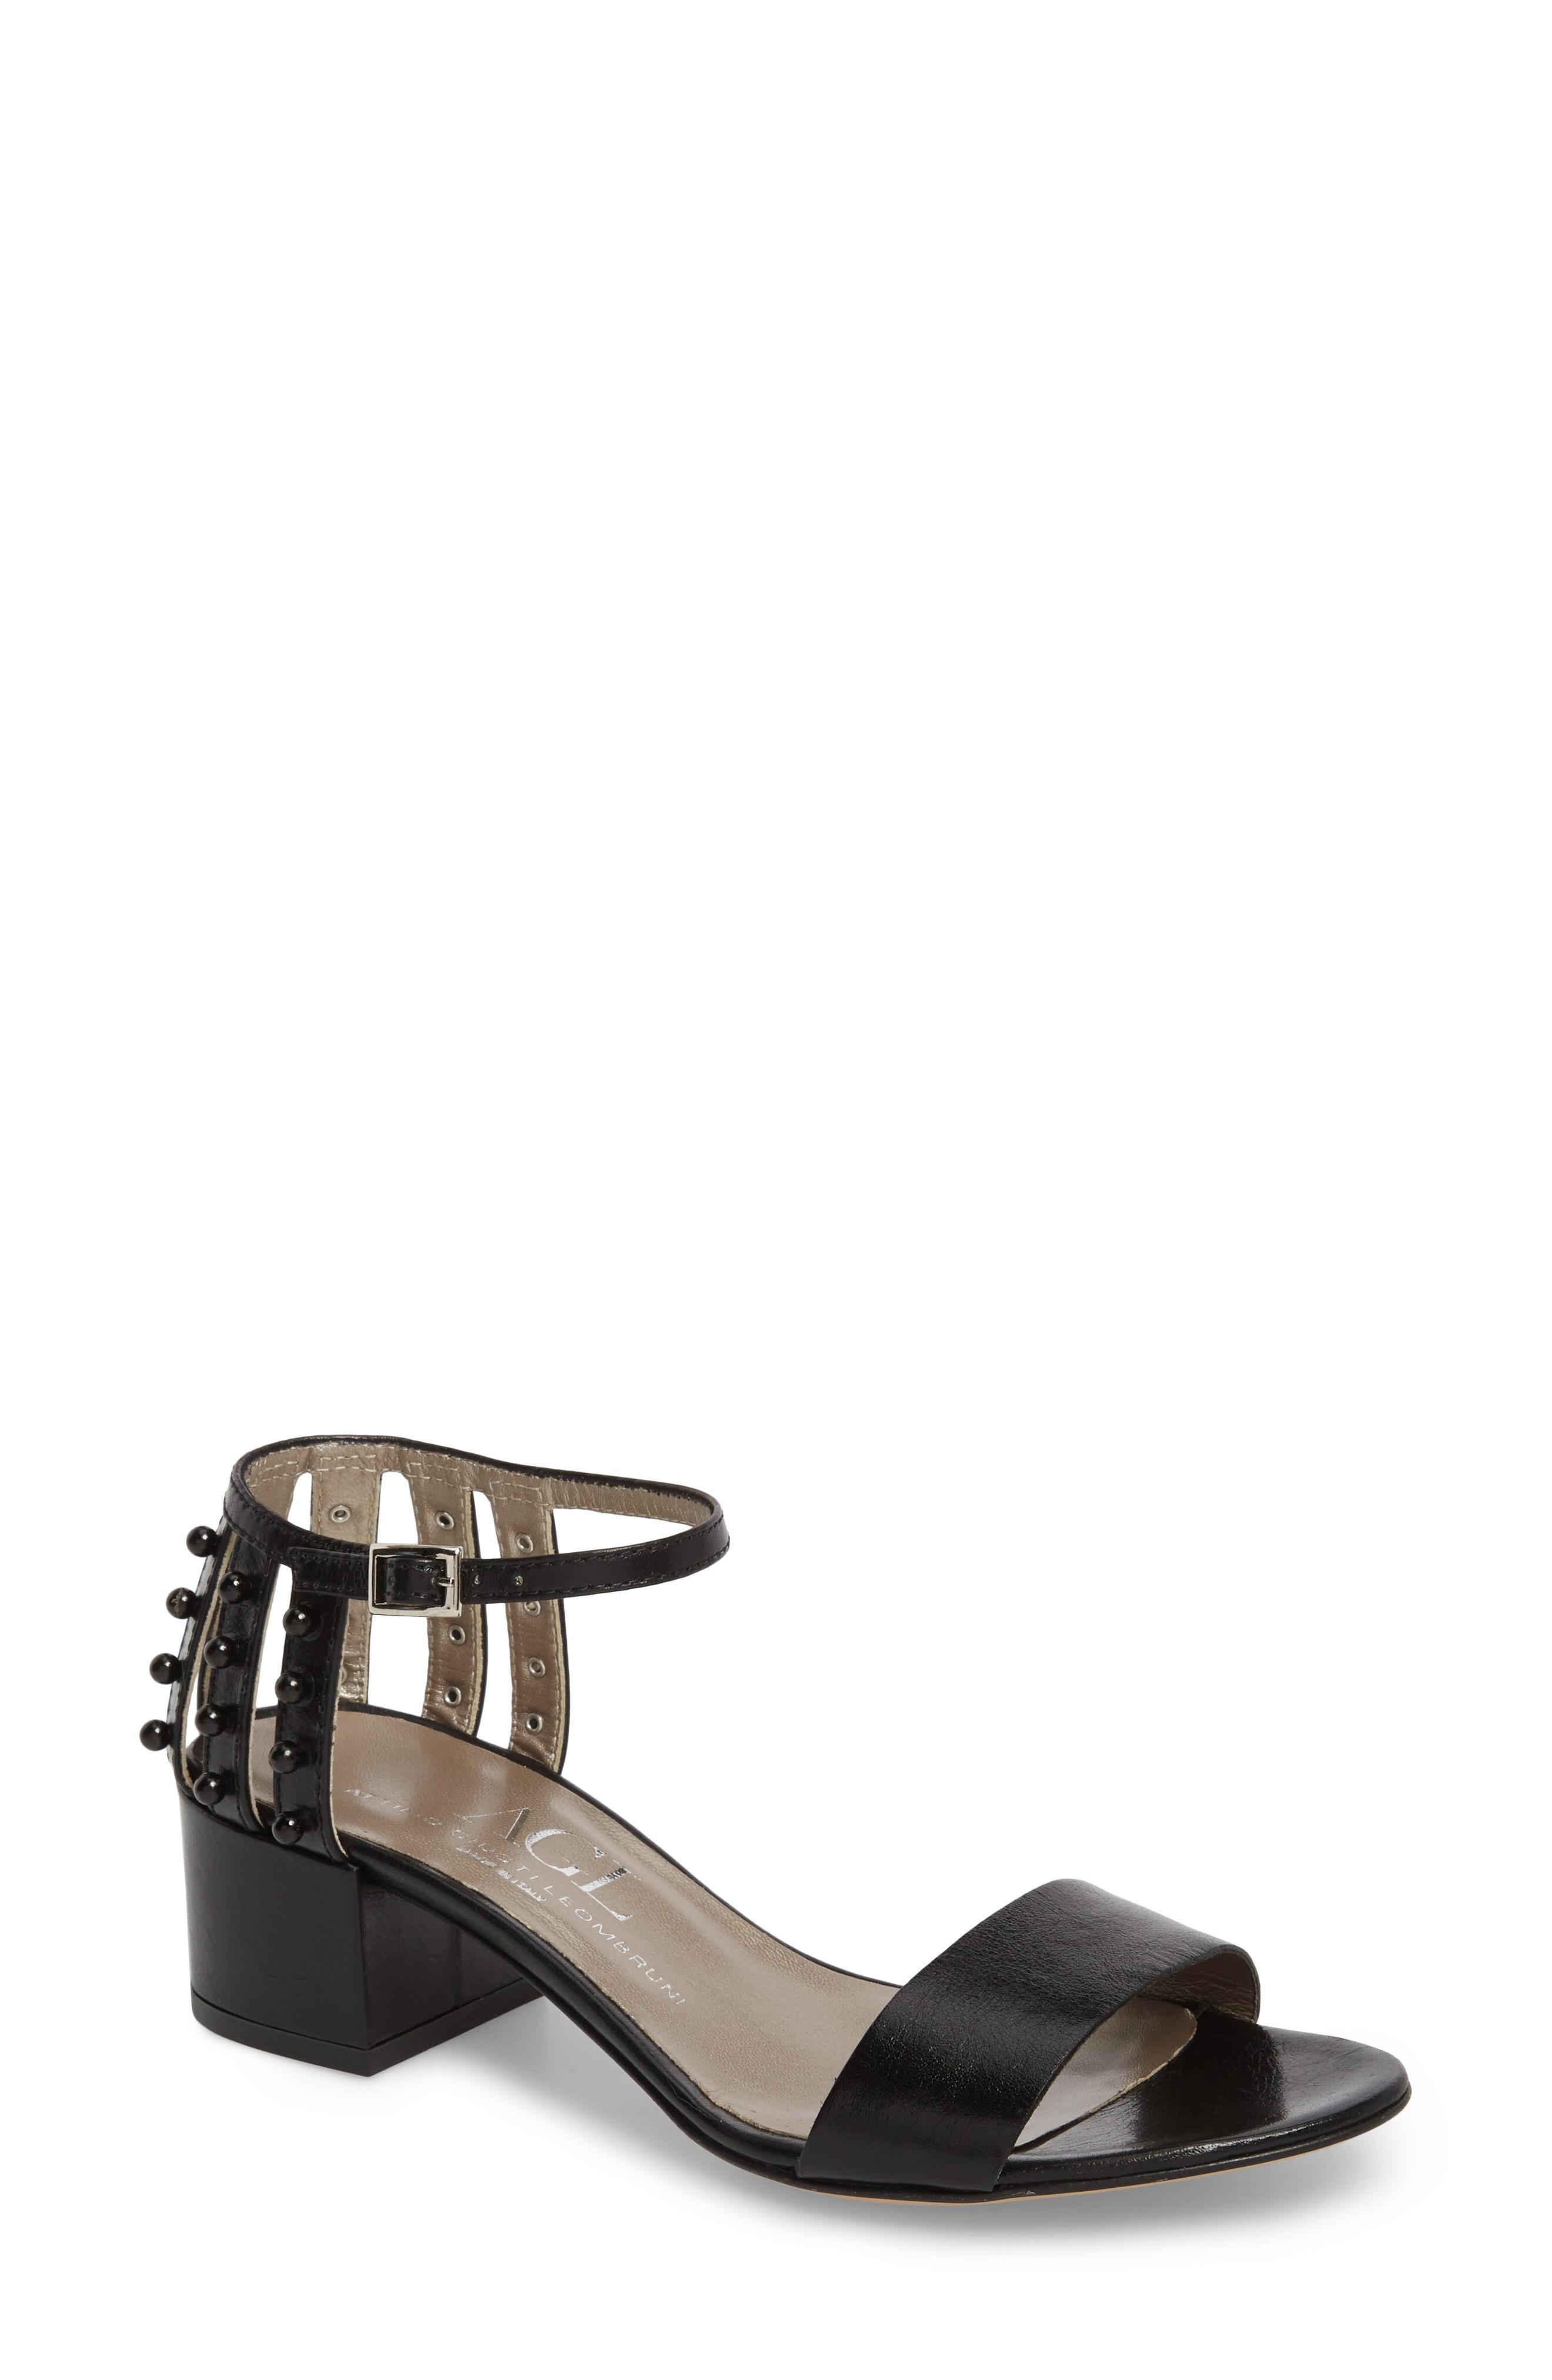 ae82d3eb304 Agl Attilio Giusti Leombruni Embellished Ankle Strap Sandal In Black ...